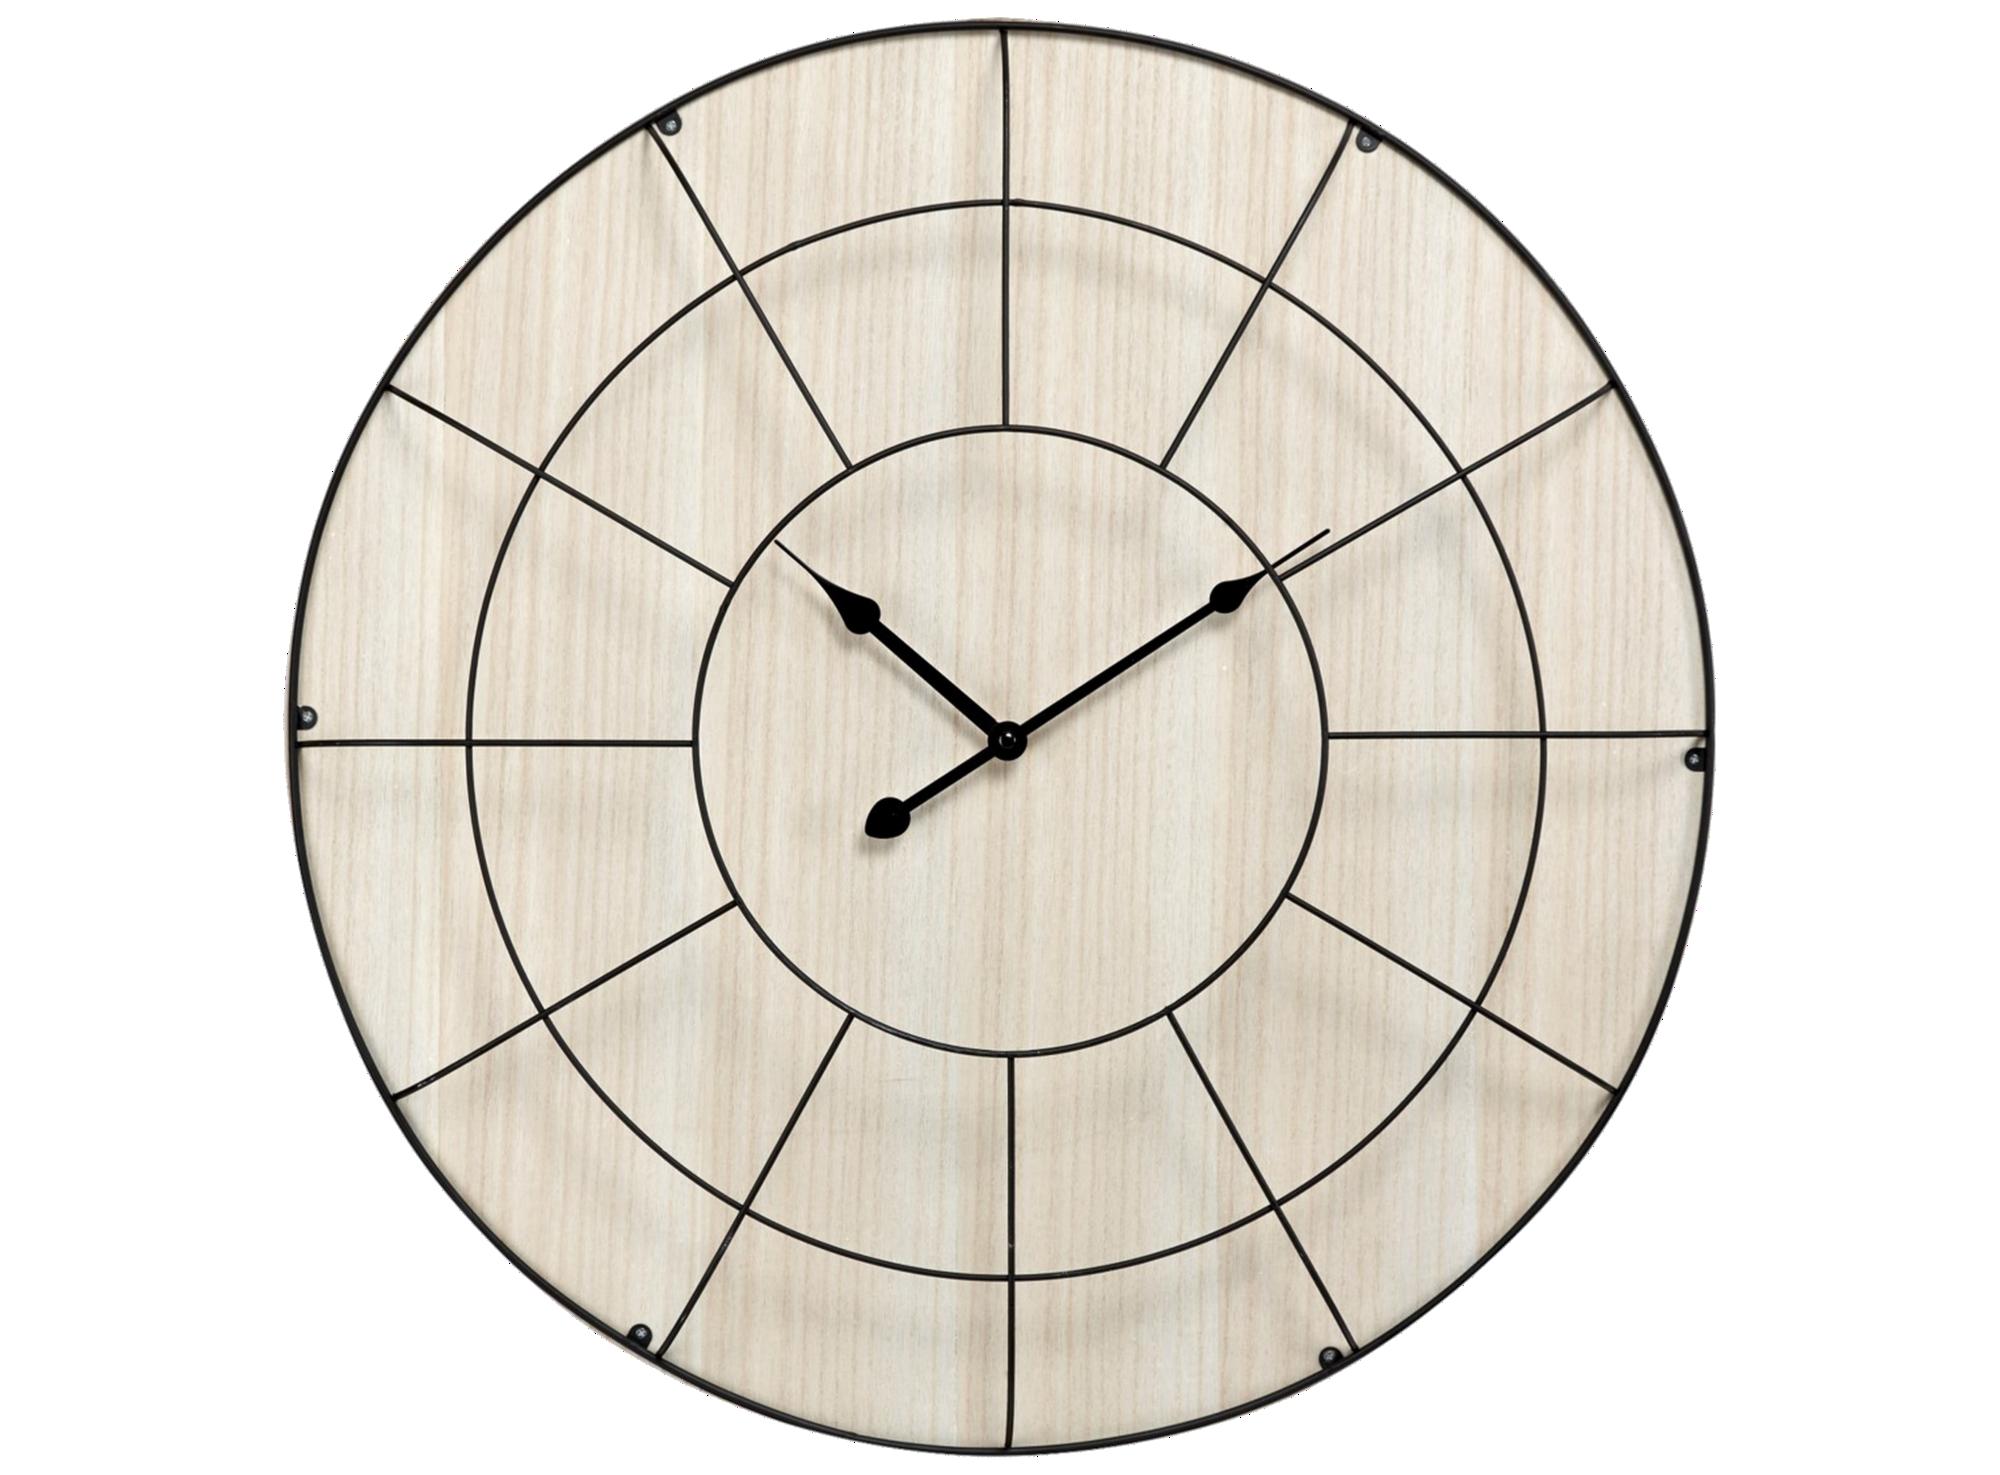 44 Horloge D60cm Filaire Bois Fly Horloge Murale Moderne Horloge Murale Horloge